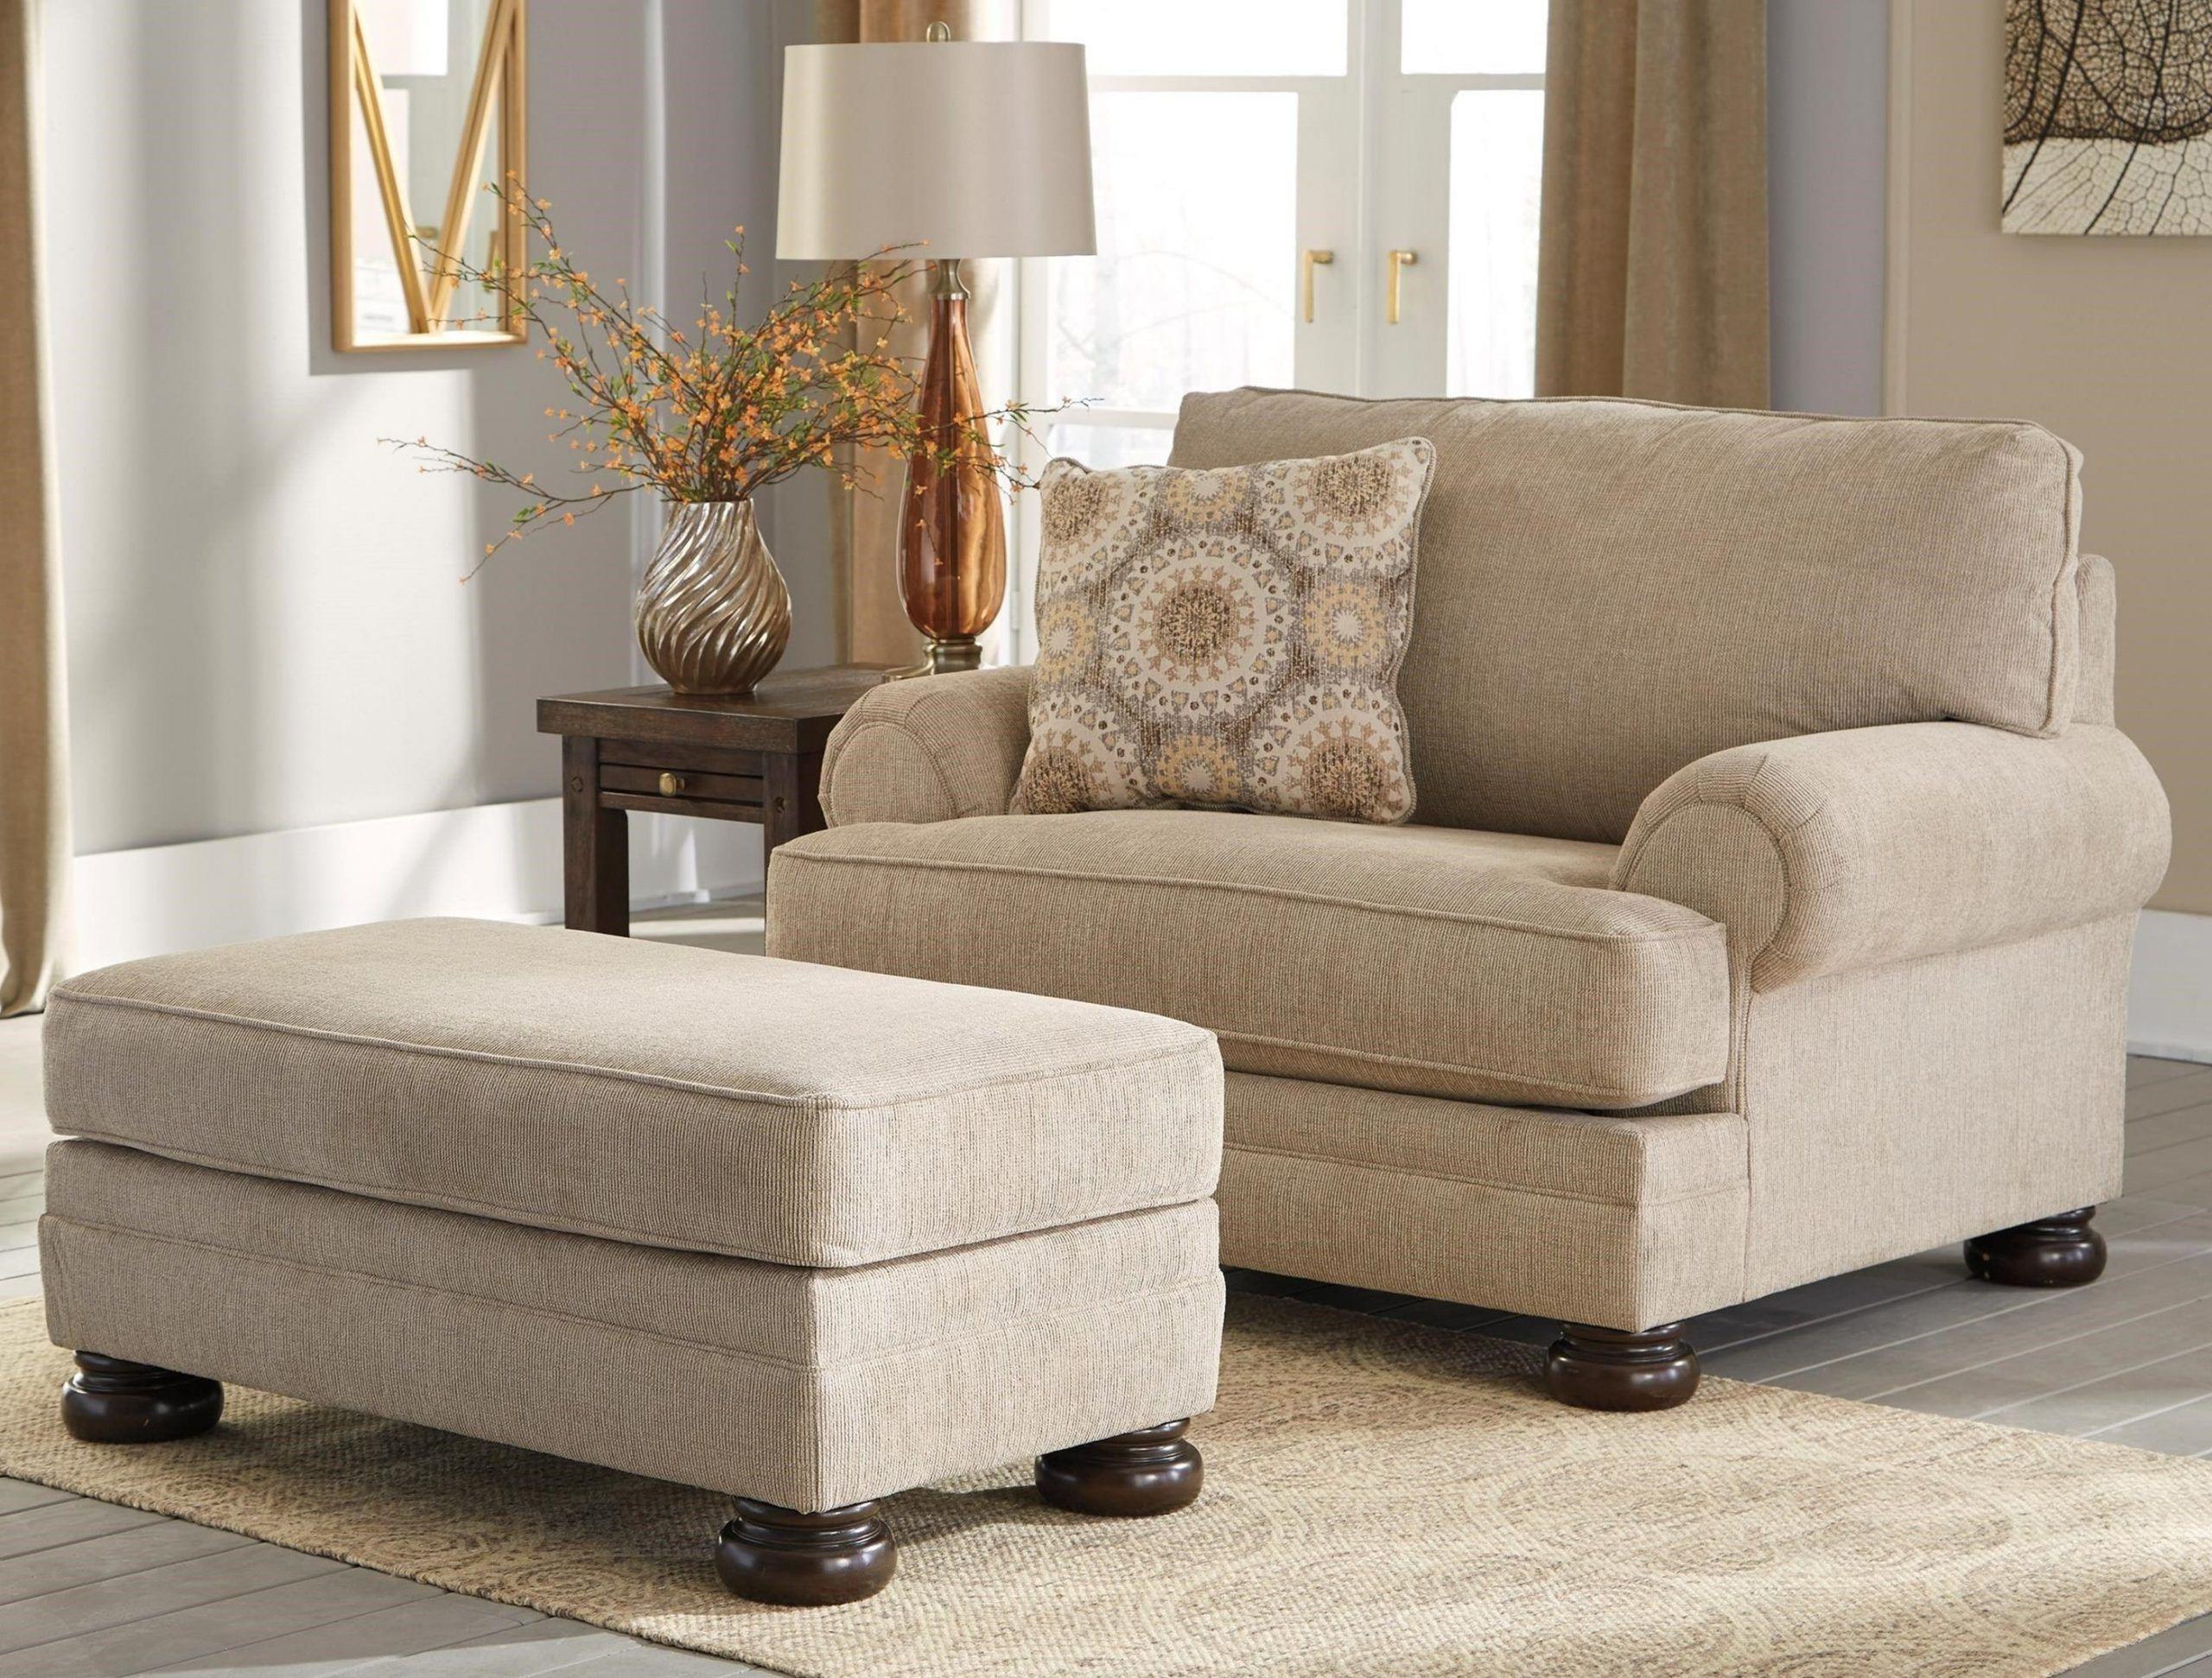 Chair And A Half With Ottoman Set Topdekoration Com In 2020 Ottoman In Living Room Chair And A Half Ottoman Set